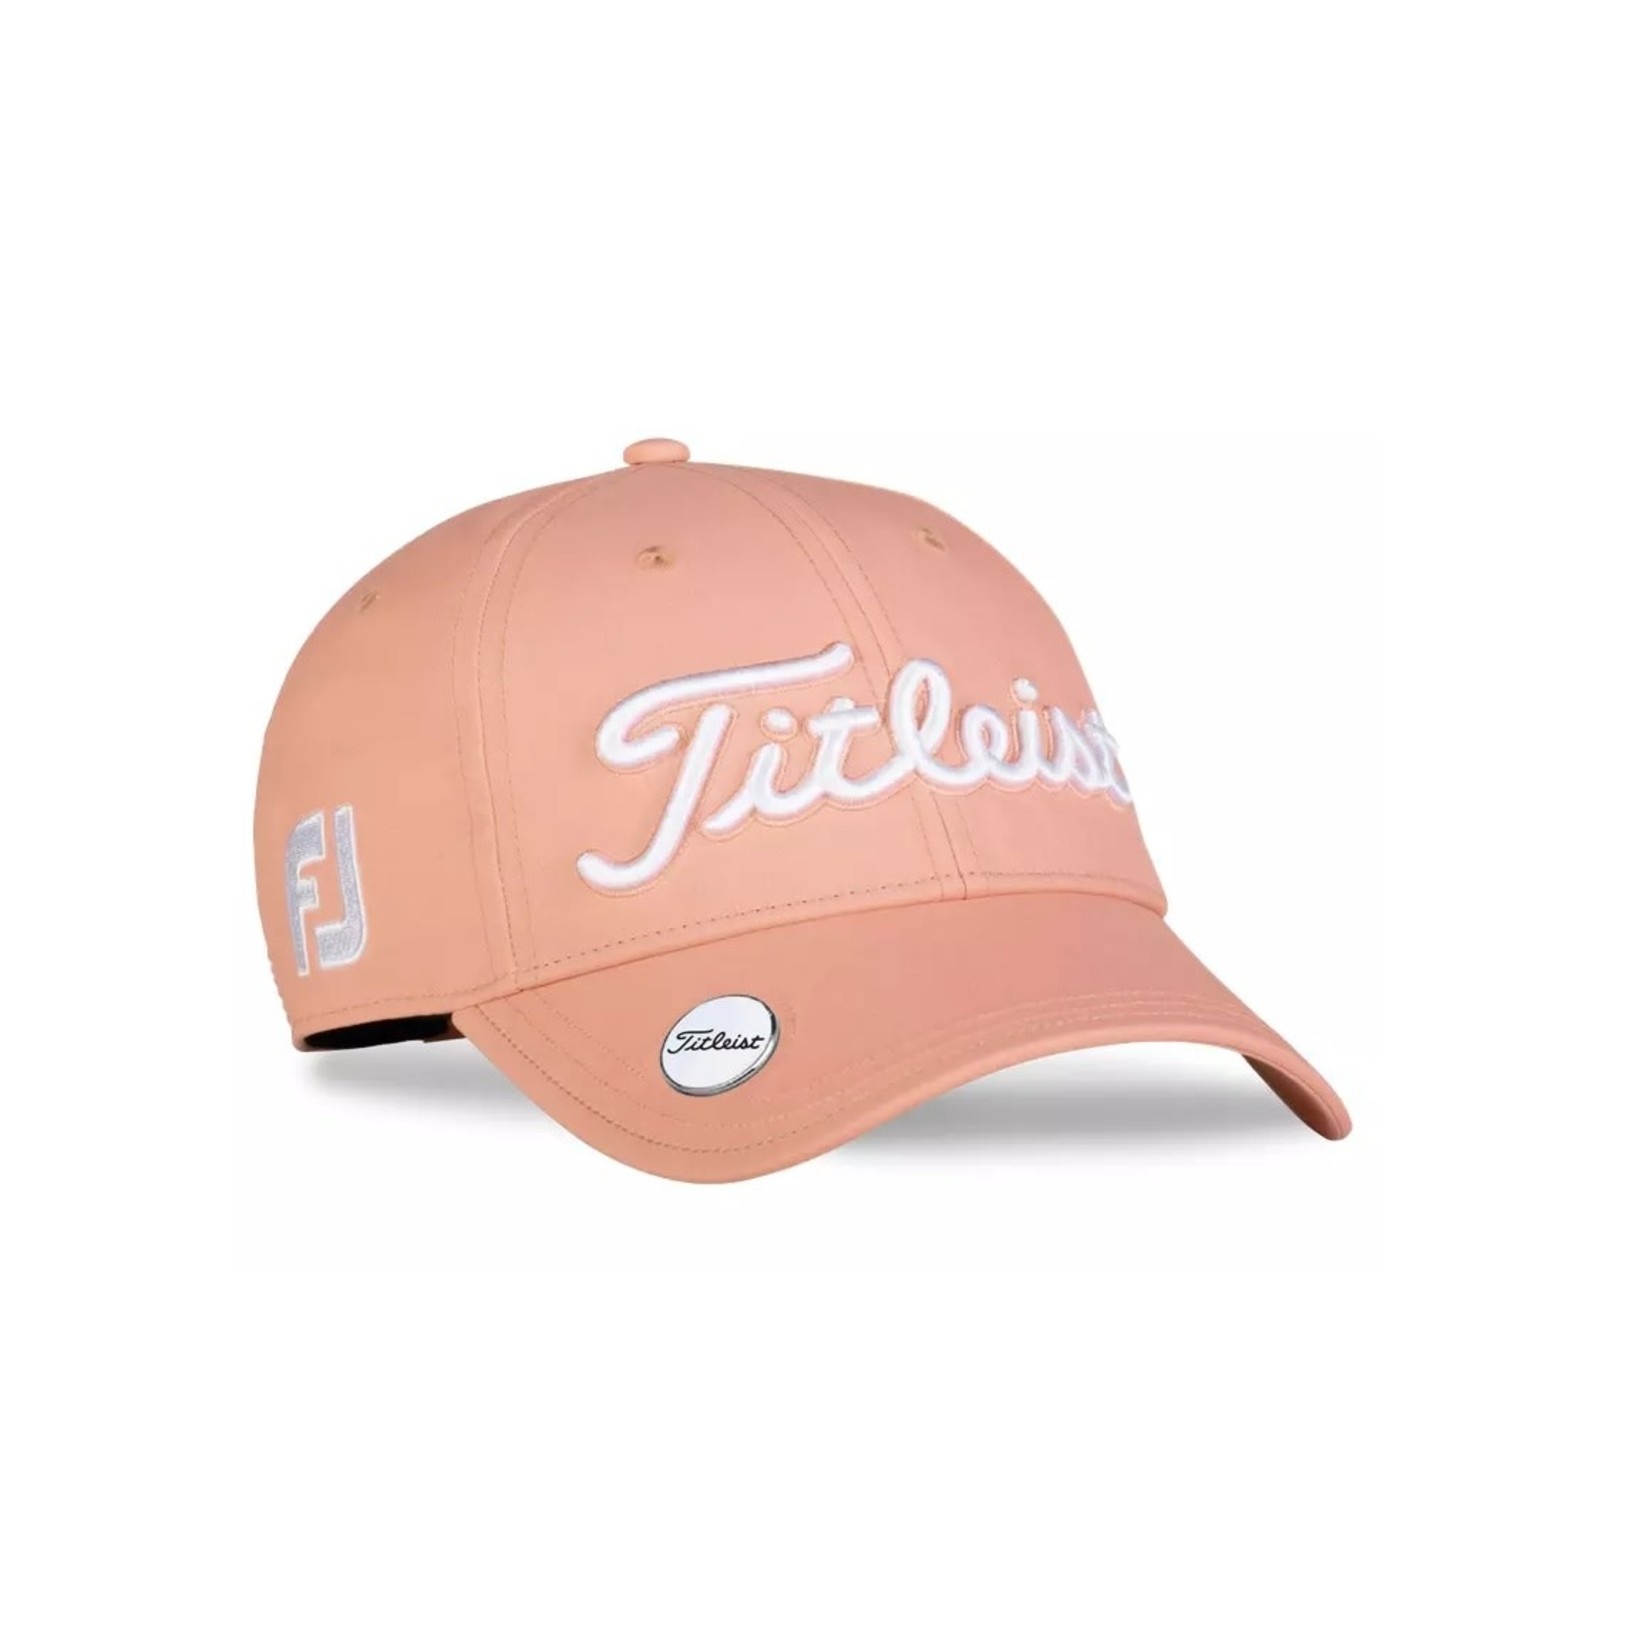 Titleist Titleist Tour Performance Pastel Oranje CAP